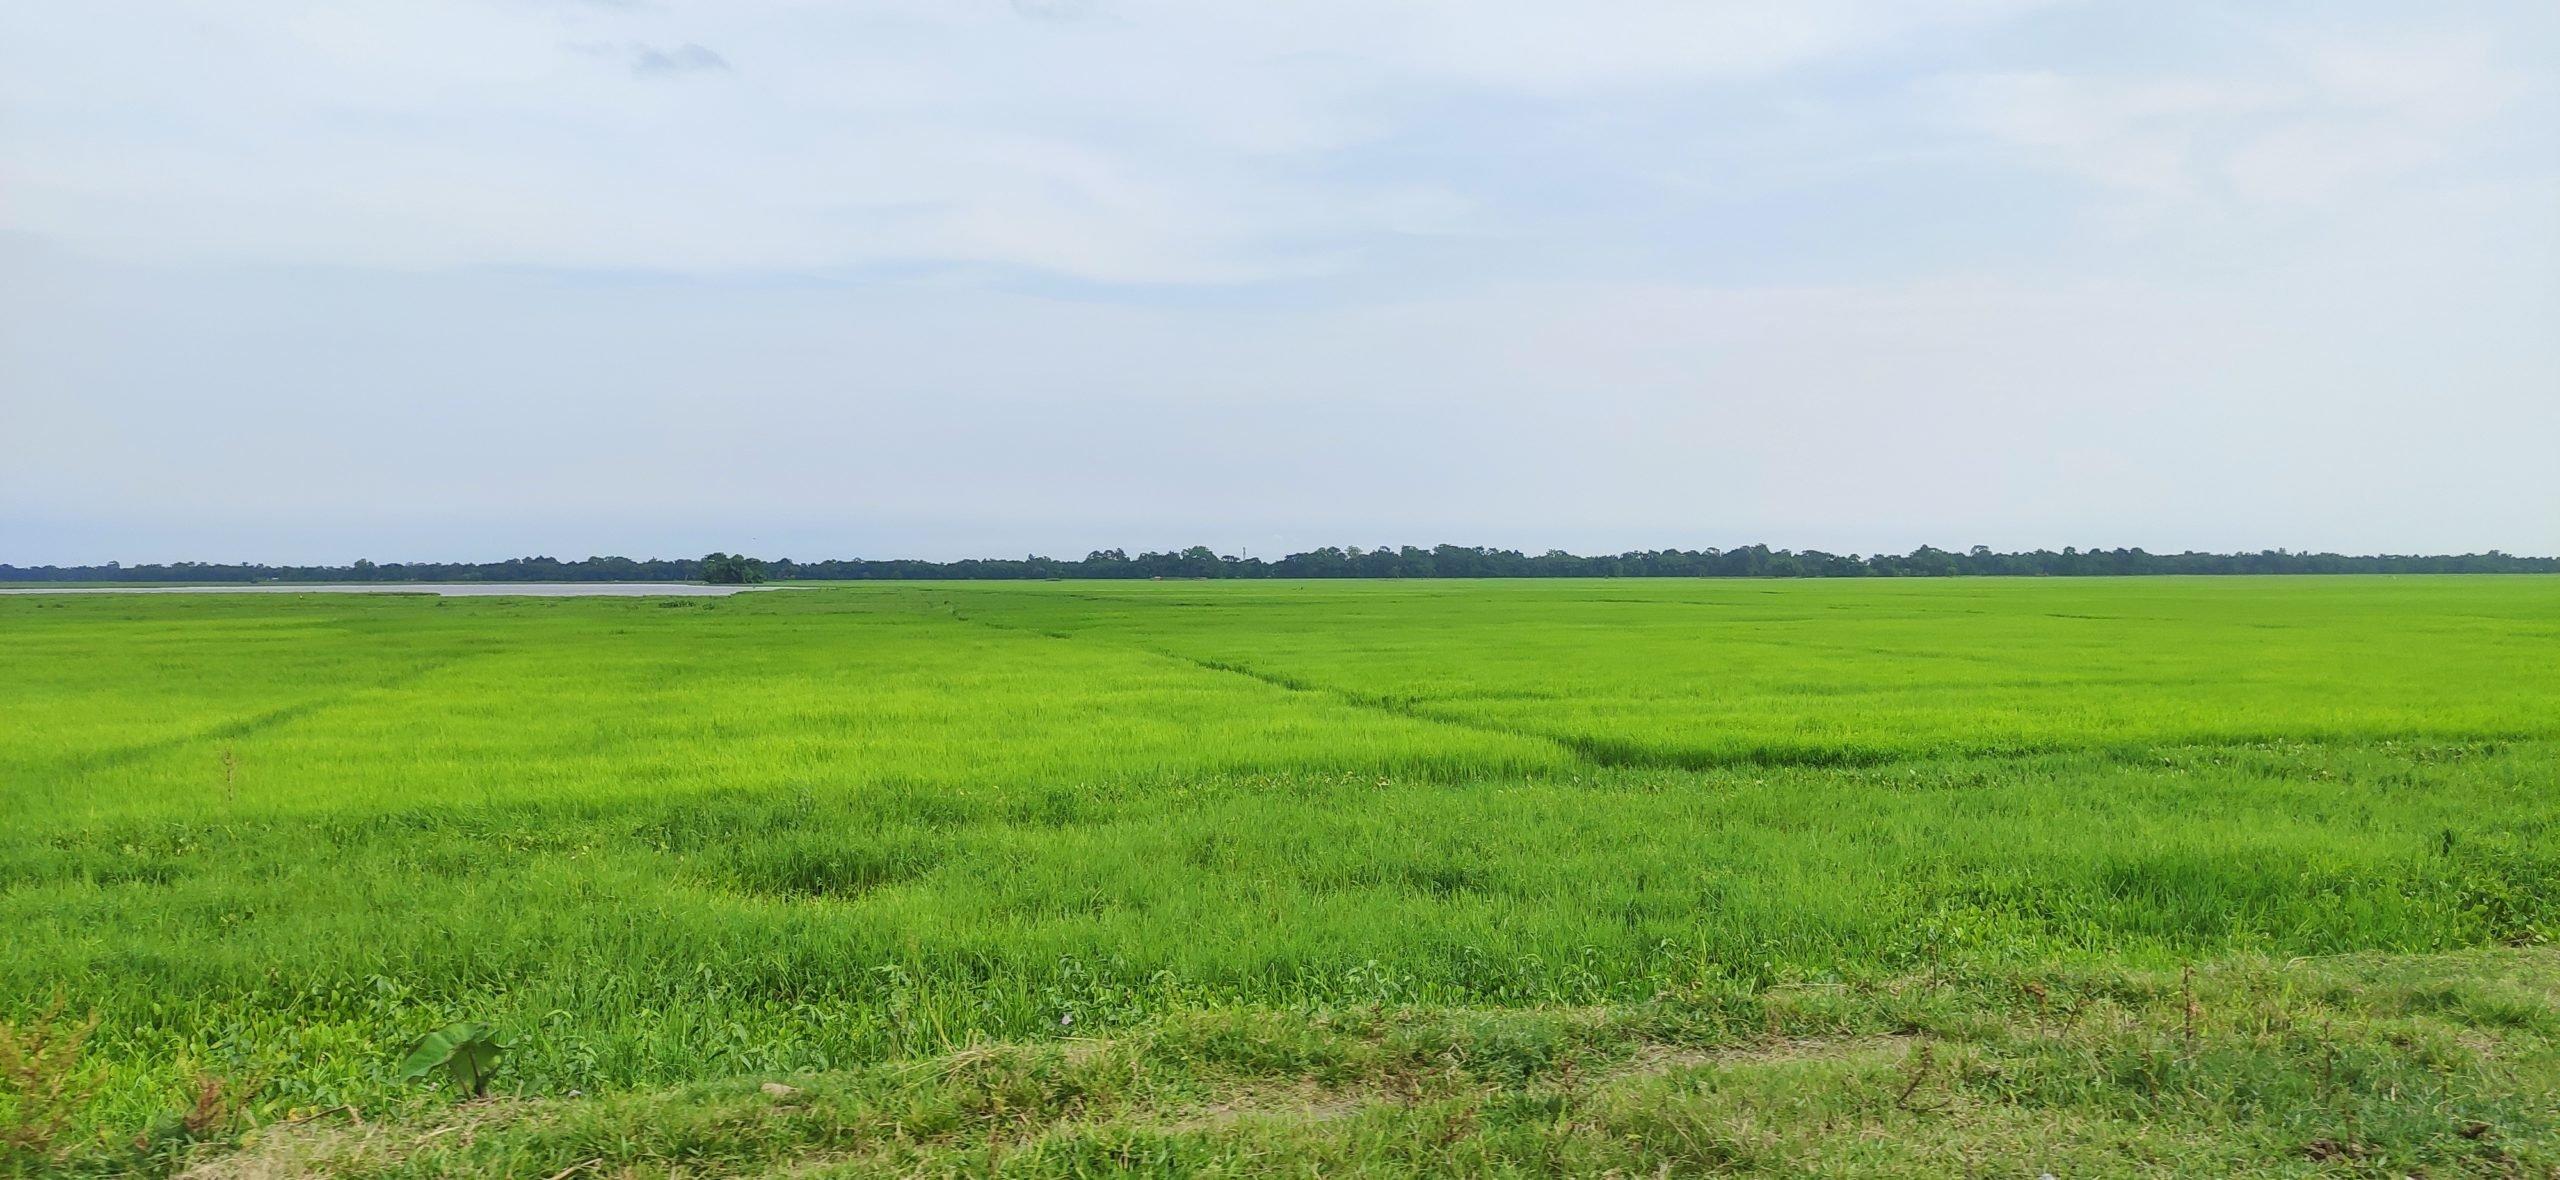 Bao rice paddy, Majuli, Assam, India, Gurvinder Singh